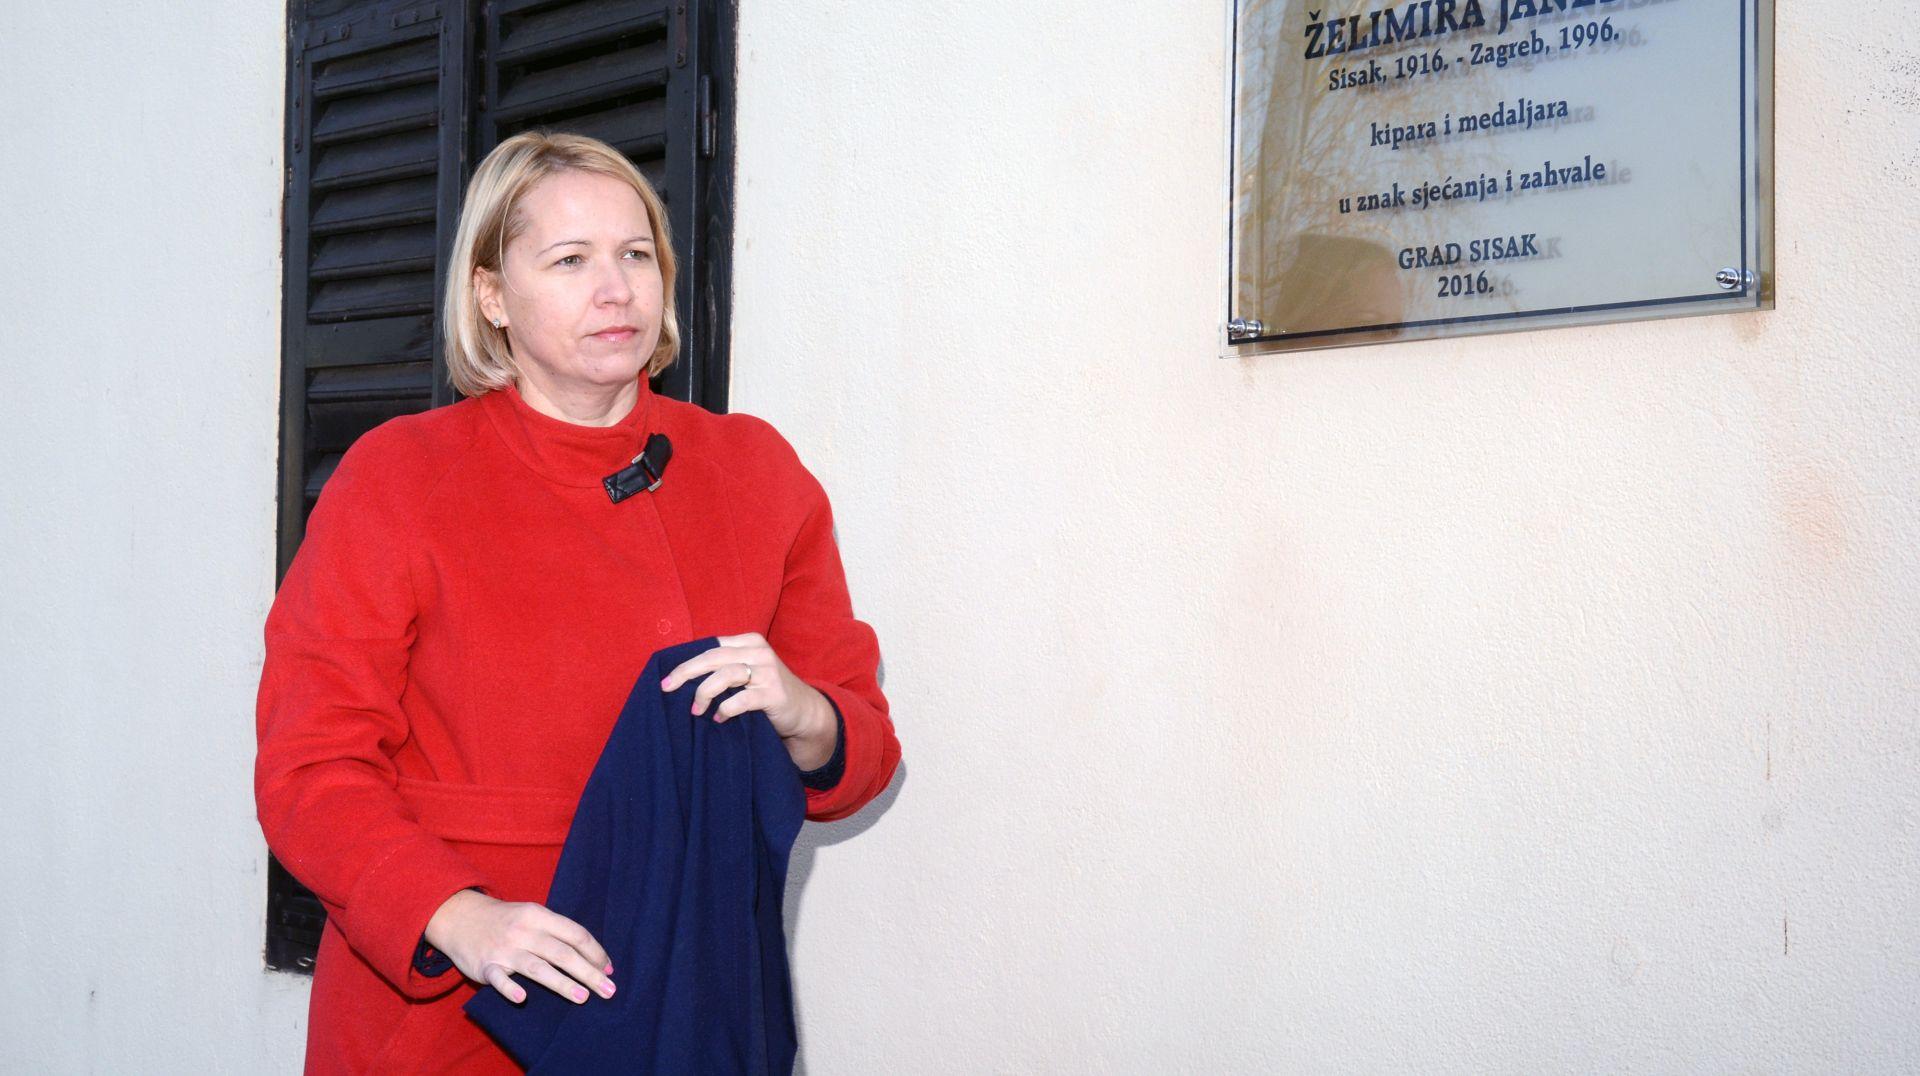 SISAK Stožer za obranu Rafinerije kod župana i gradonačelnice- protiv odvoza nafte iz Siska